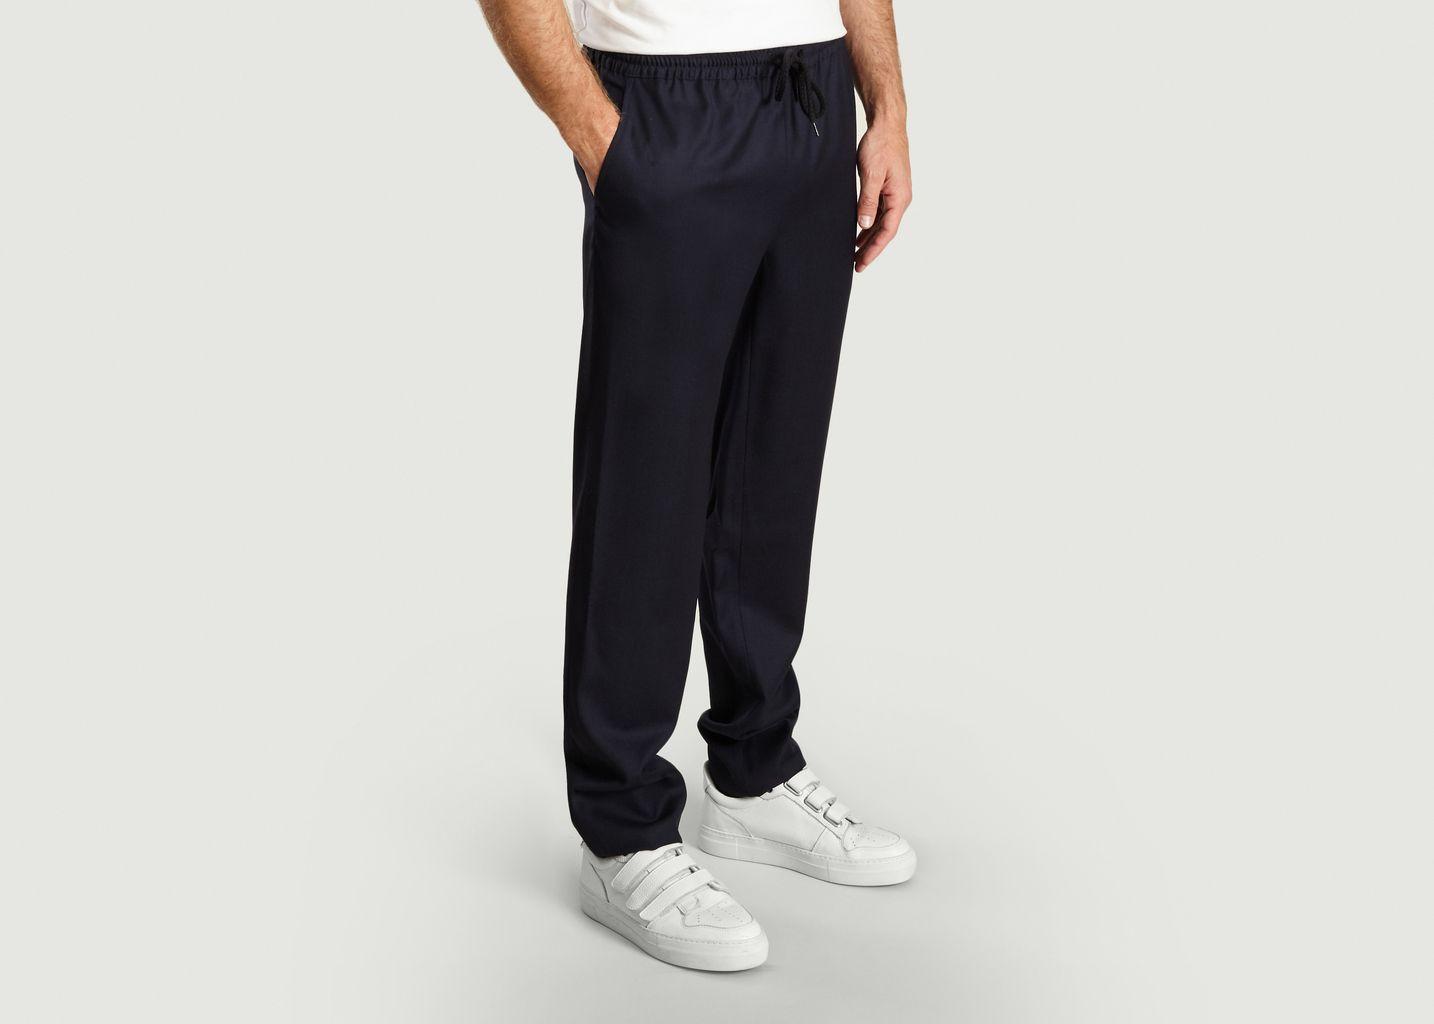 Pantalon Jean François - Editions M.R